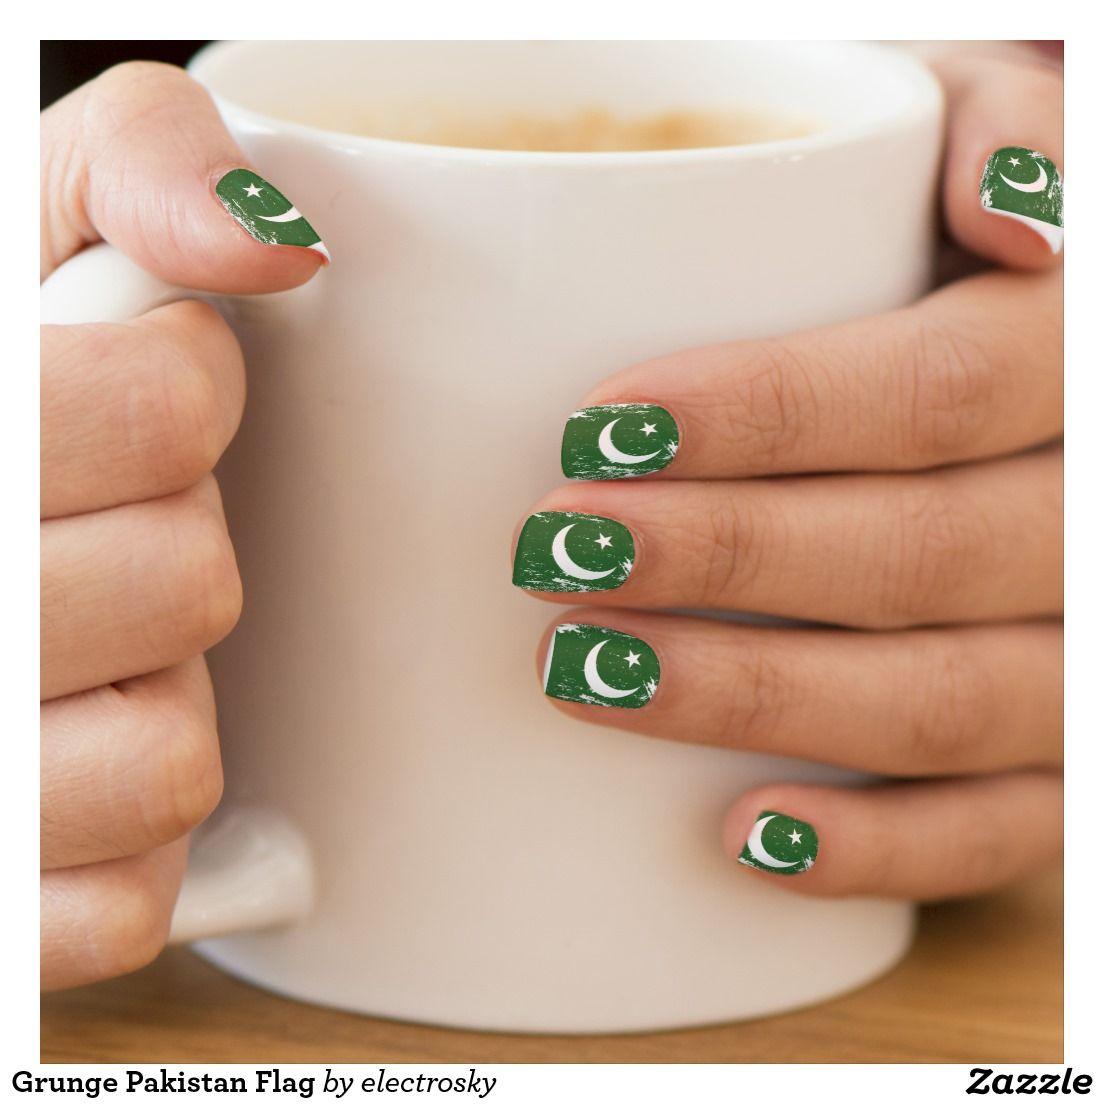 Grunge Pakistan Flag Minx® Nail Art | soul and heart | Pinterest ...